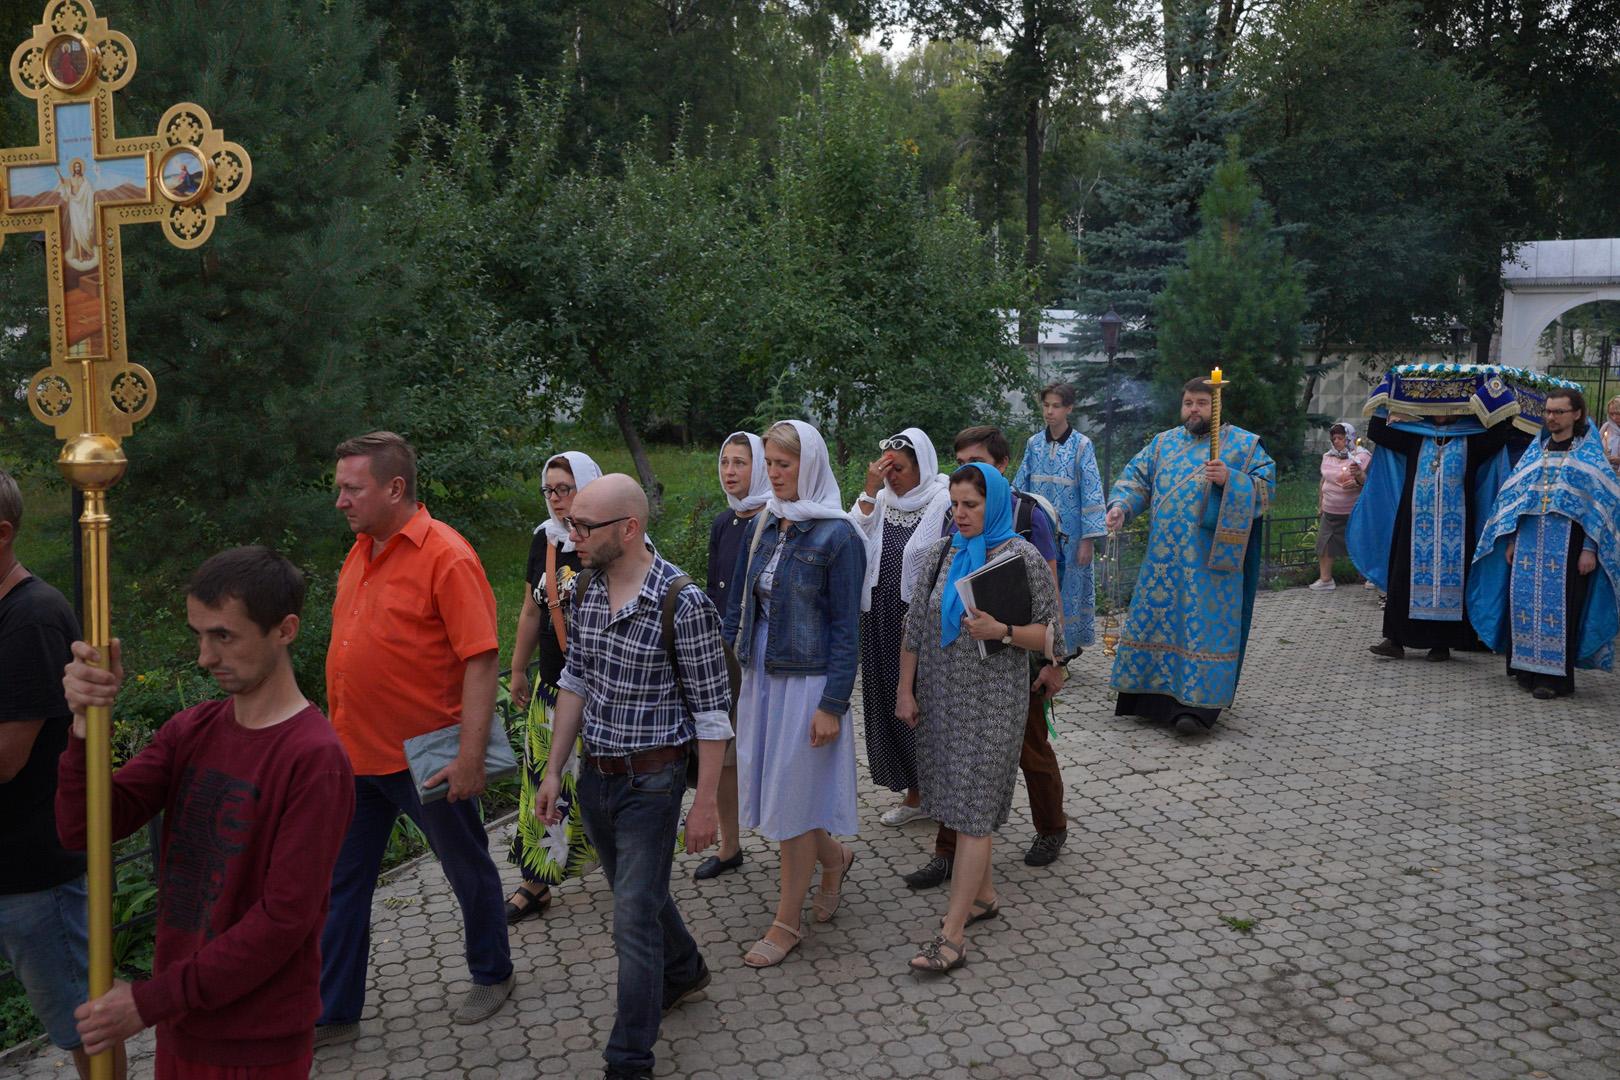 http://monuspen.ru/photoreports/eb9de00e1f5615849ea00b127bfcb99b.jpg